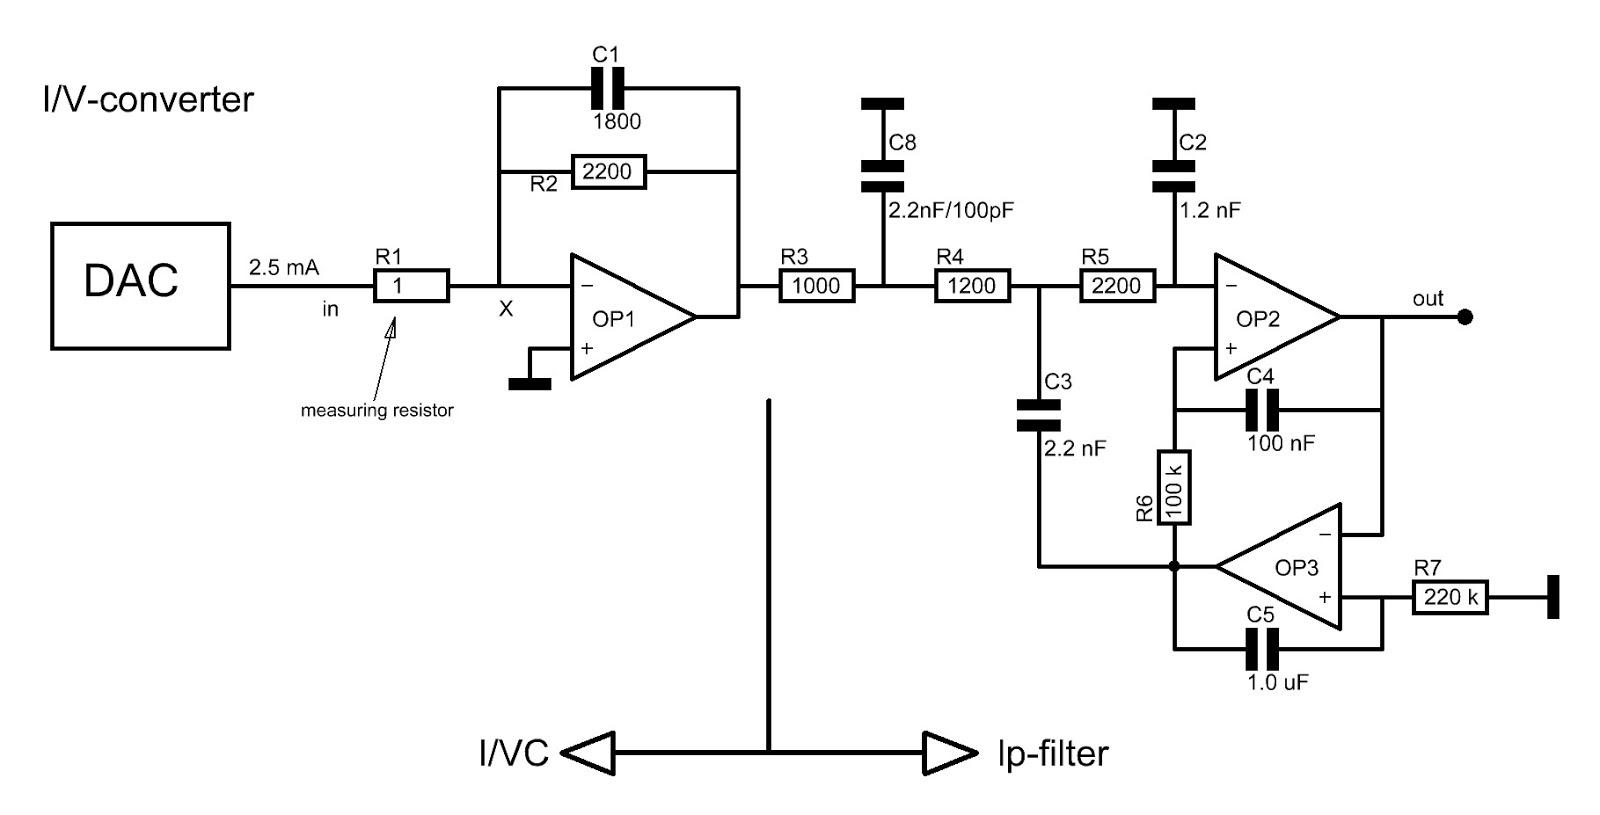 mao audiophile modifications